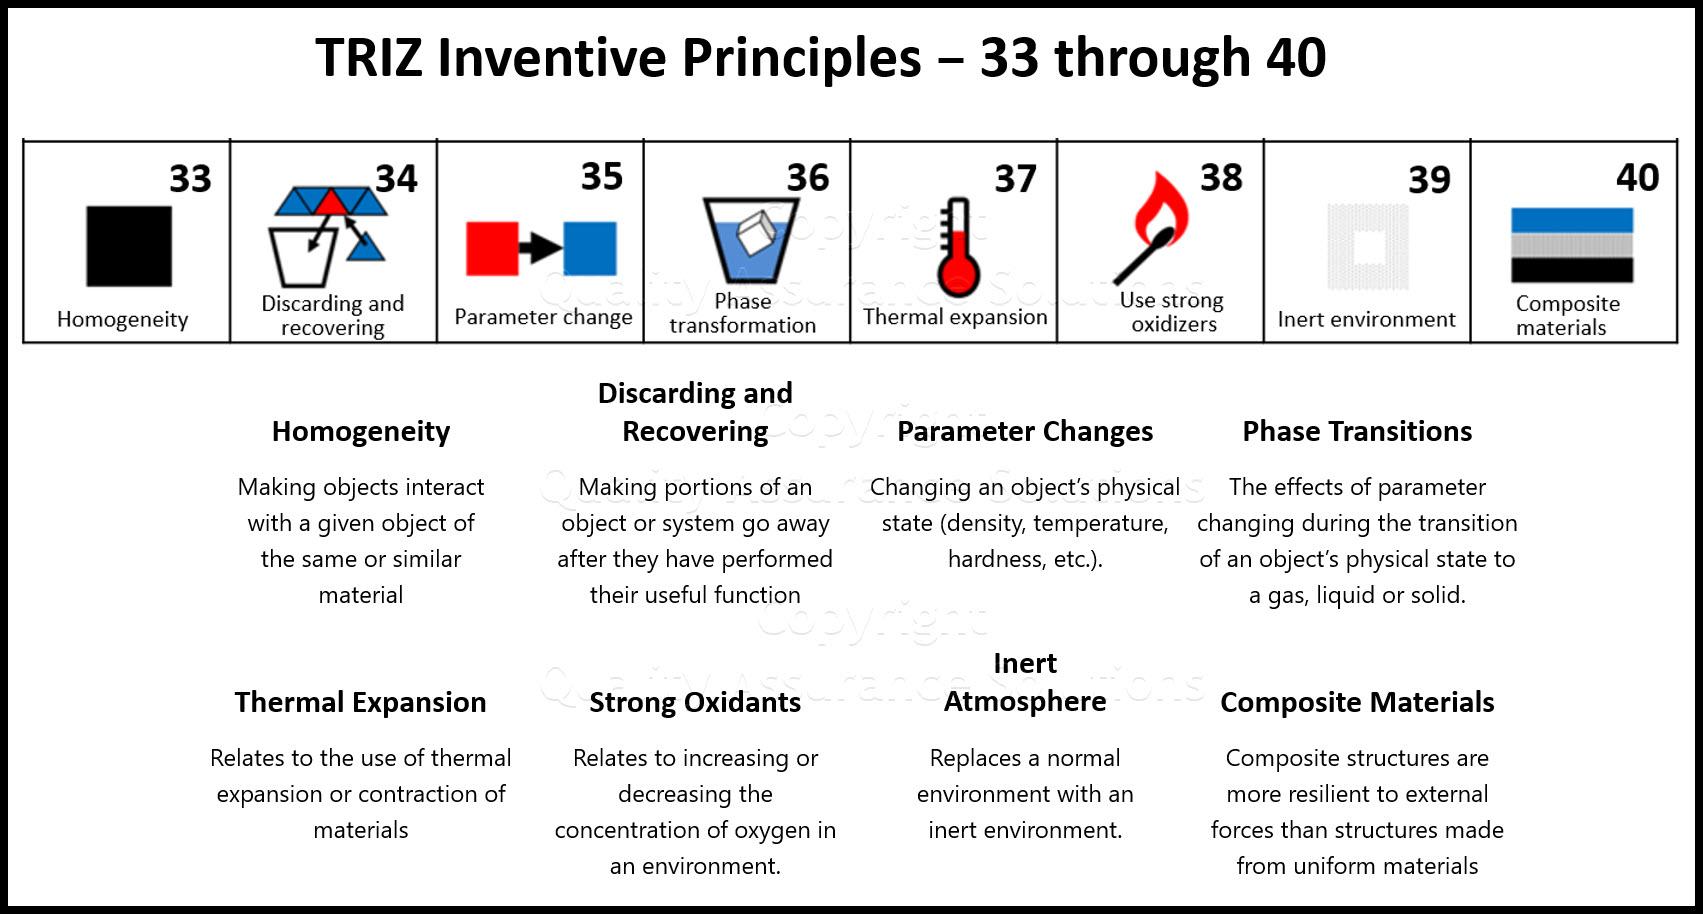 TRIZ-Inventive-Principles-33 business slide